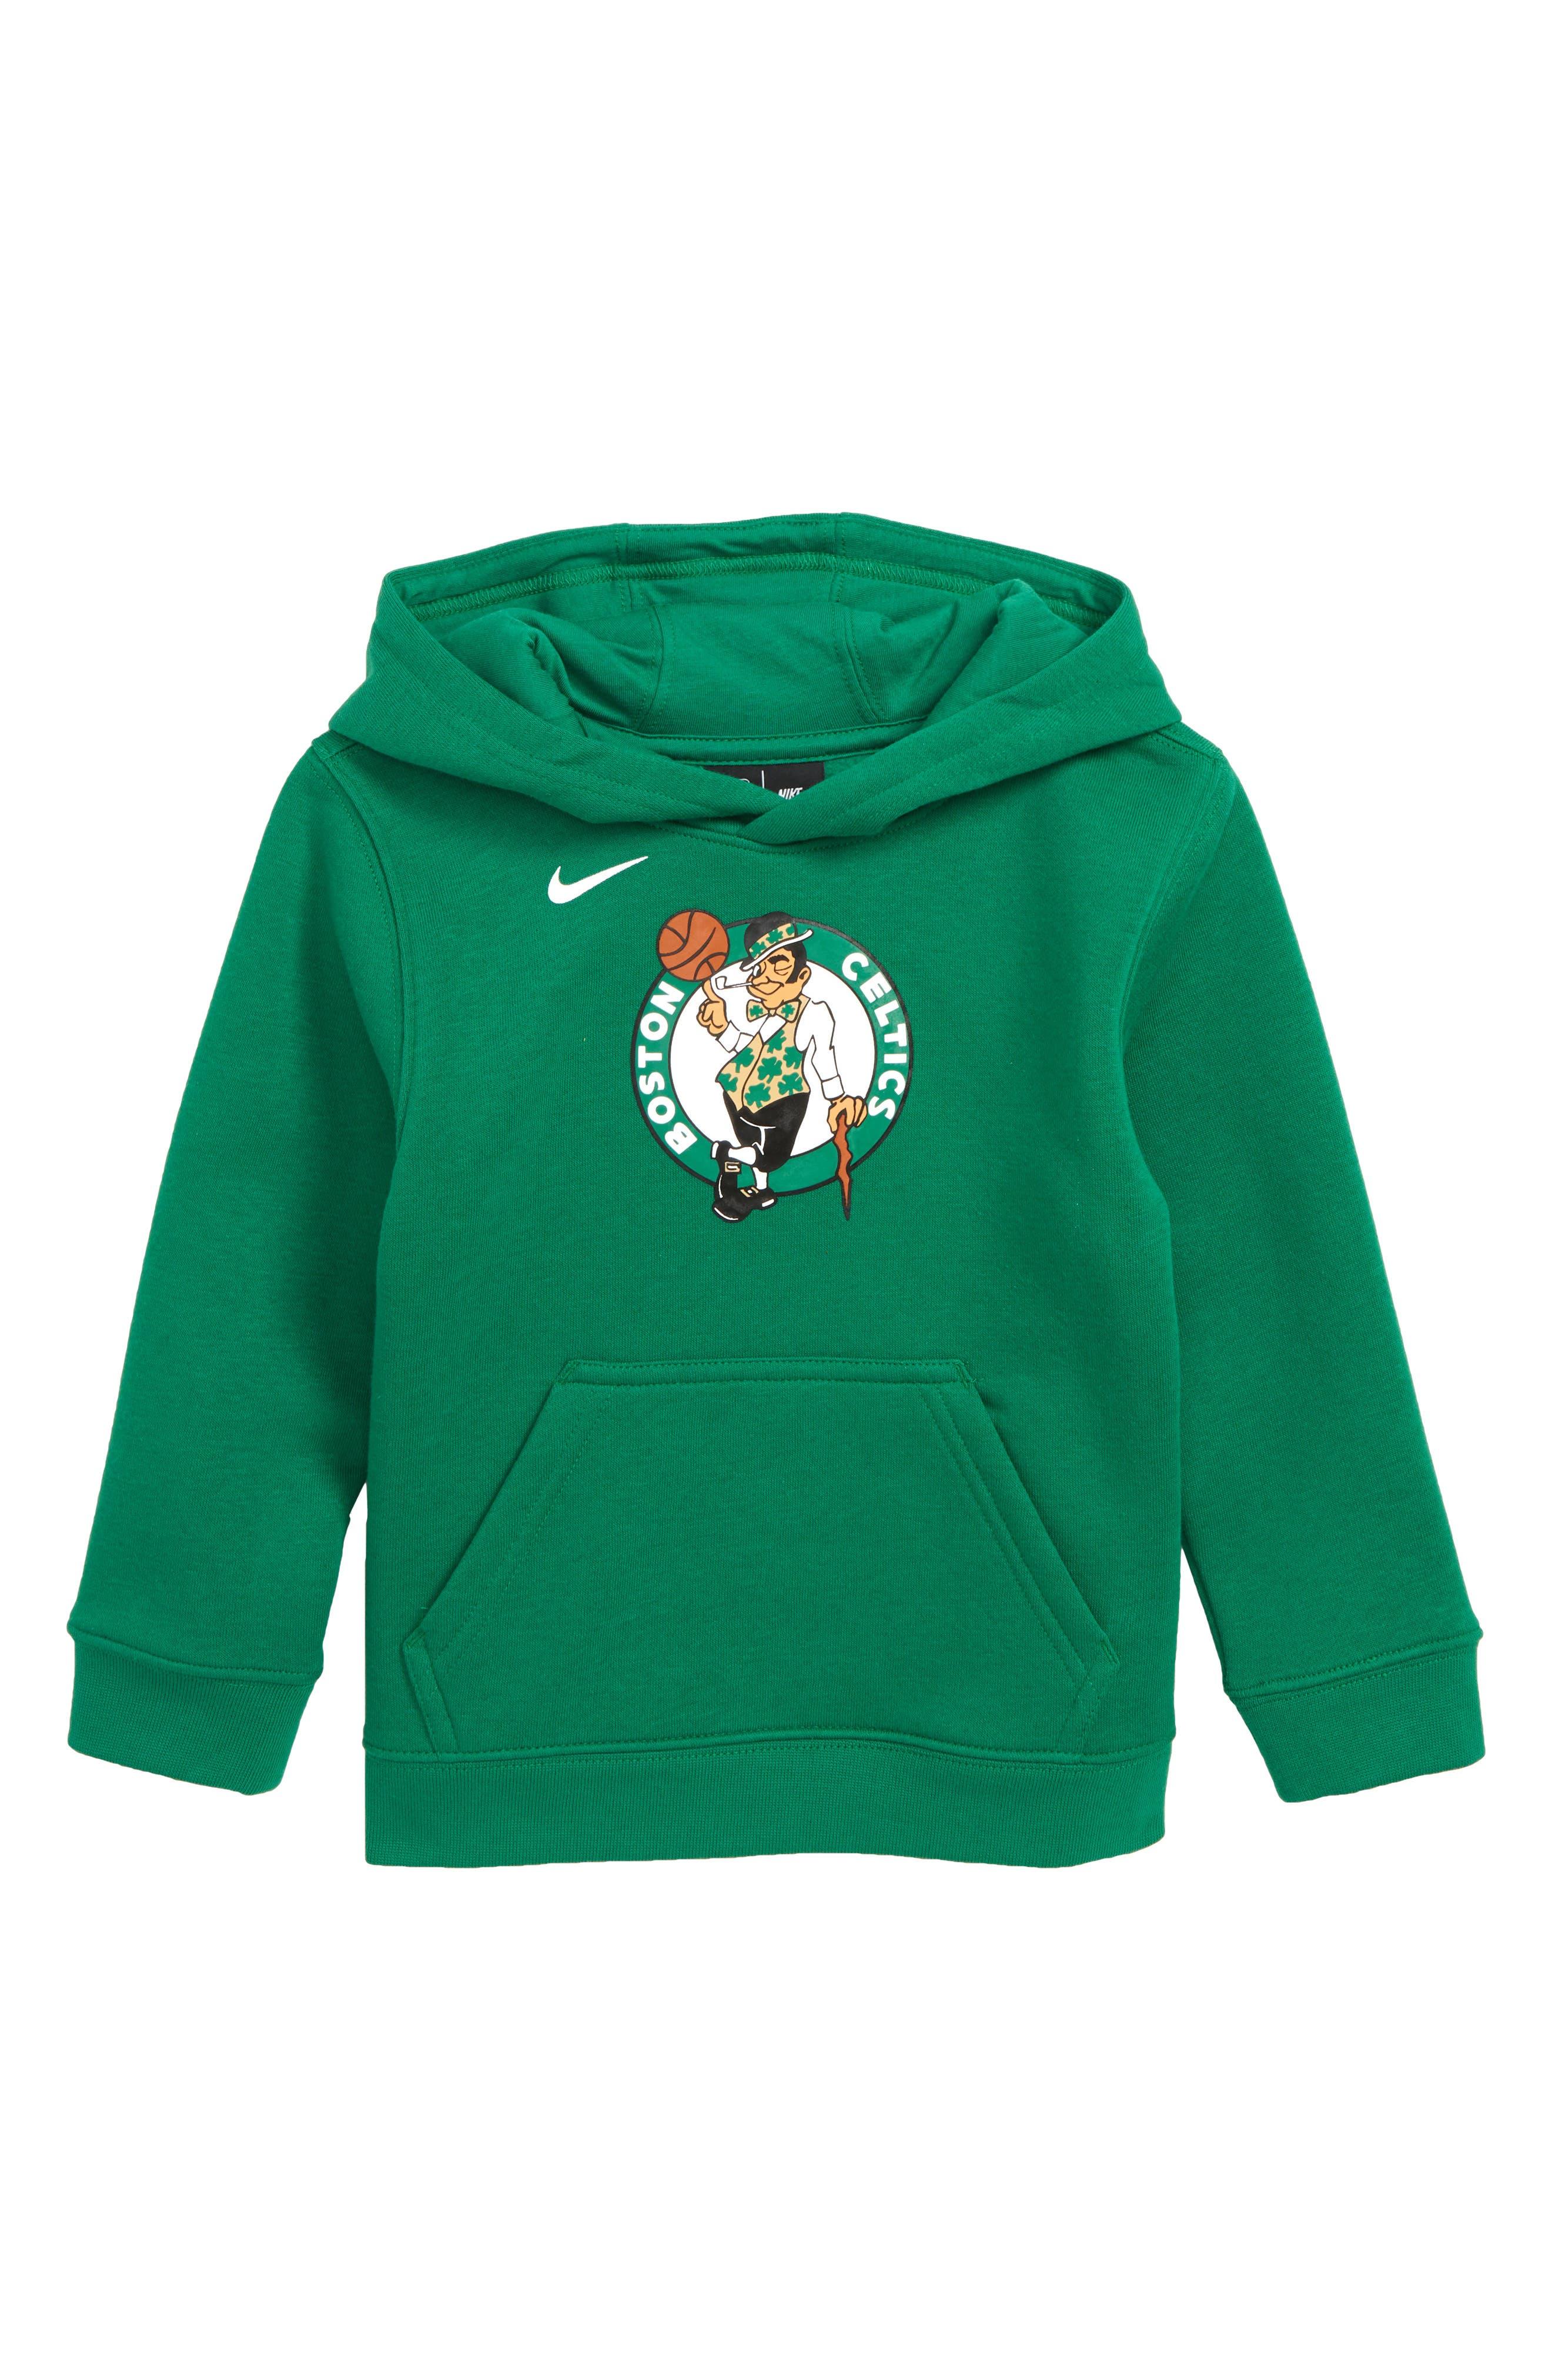 Boston Celtics Hoodie,                             Main thumbnail 1, color,                             CLOVER